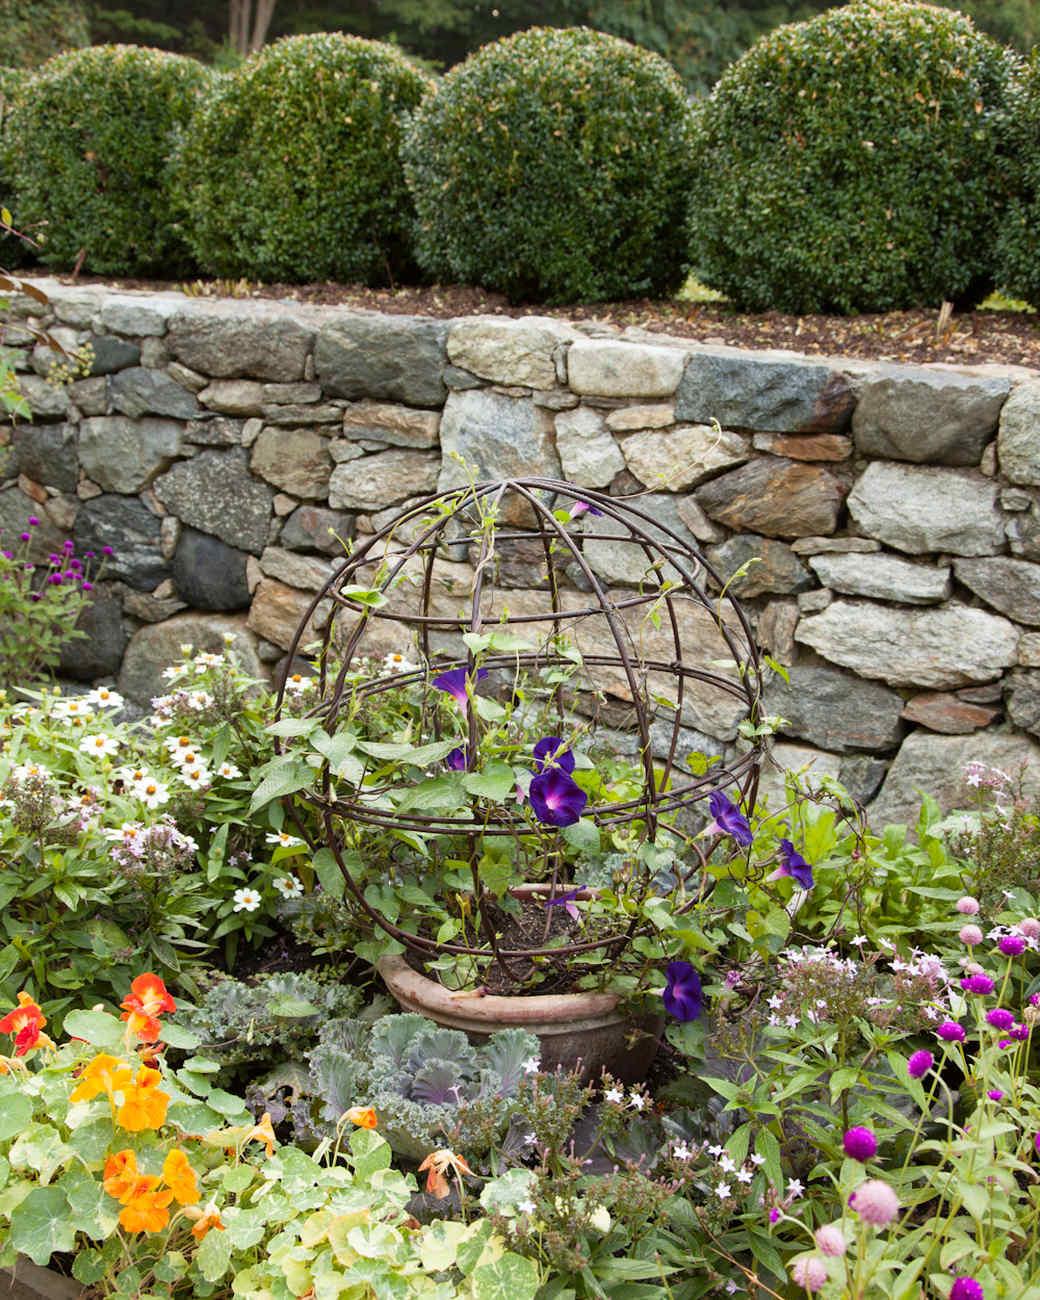 driveway-garden-msl0613-d109340-0044.jpg